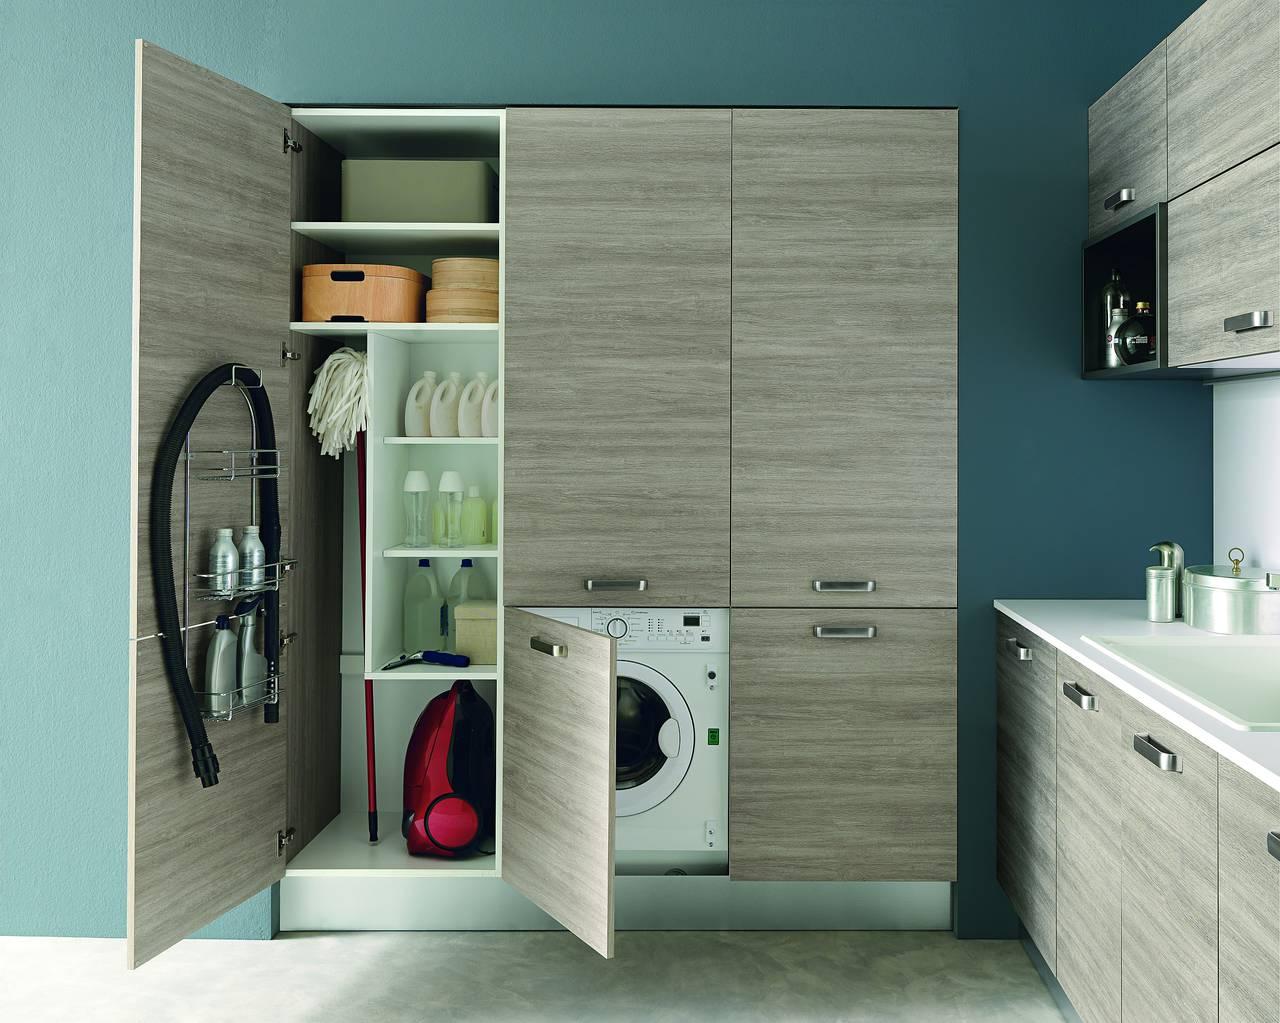 Ambiente cucina project n 50 febal lavanderia integrata - Accessori lavanderia casa ...